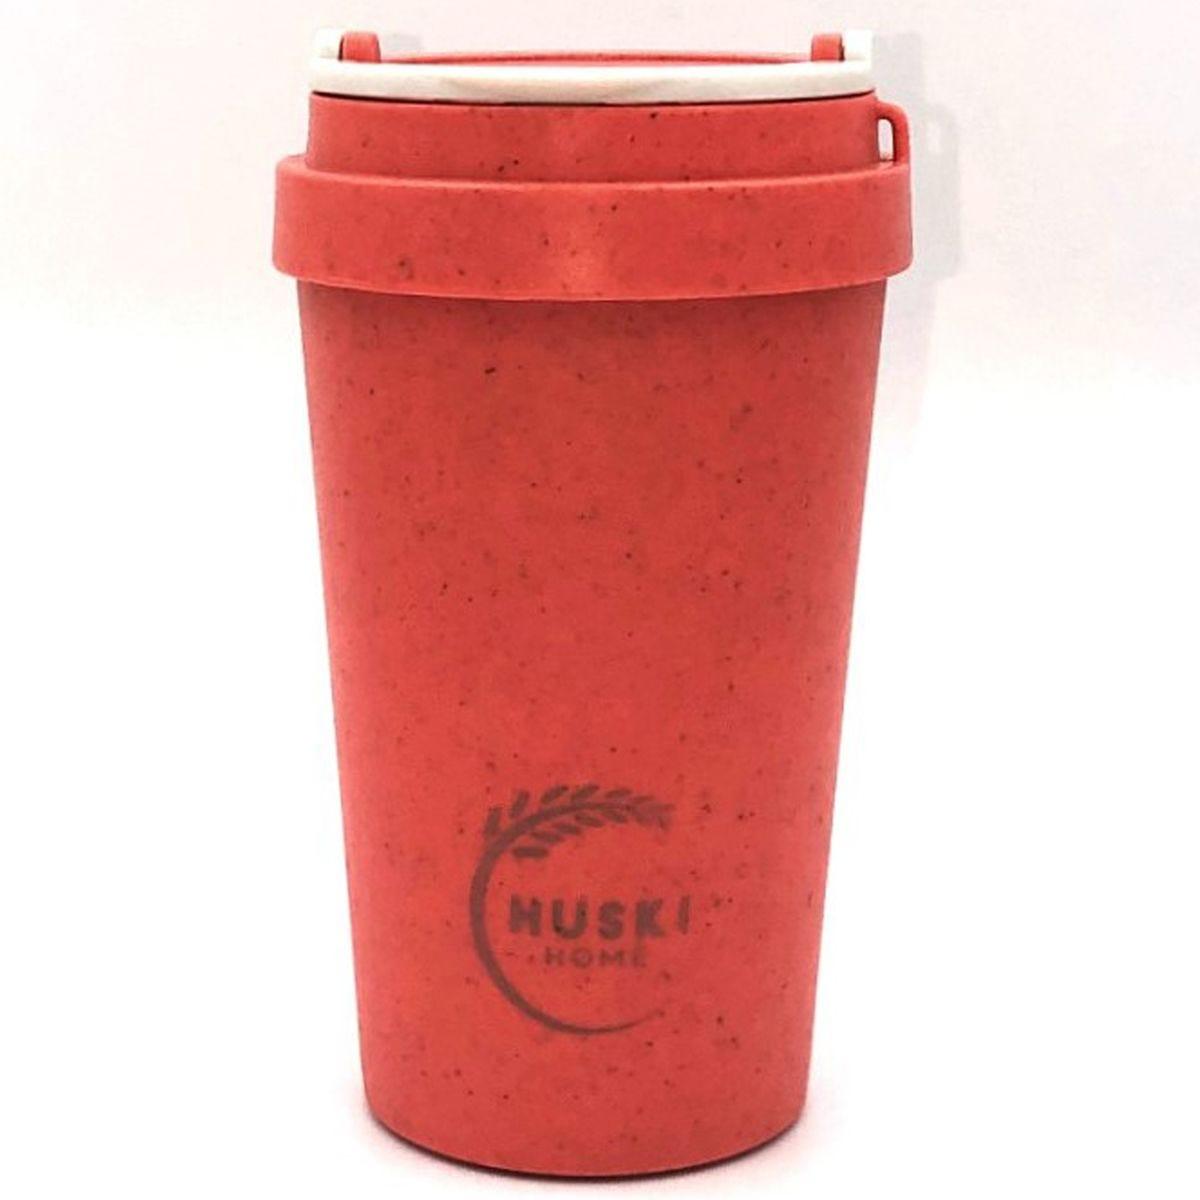 Huski Home Sustainable Rice Husk Travel Cup 400ml - Coral